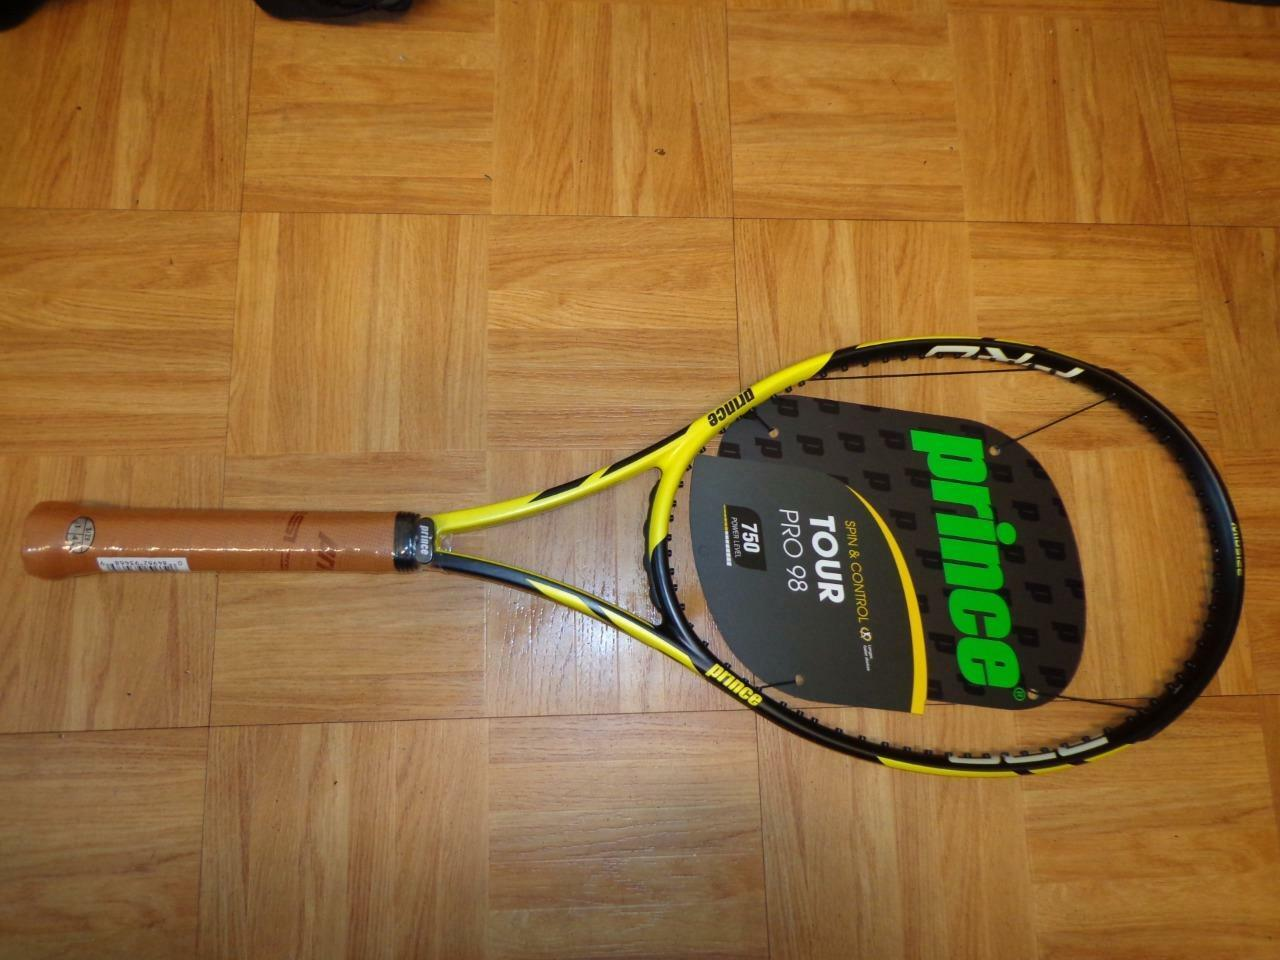 NEW PRINCE Tour PRO 98 750 Power level 18x20 10.8oz 4 3 8 grip Tennis Racquet